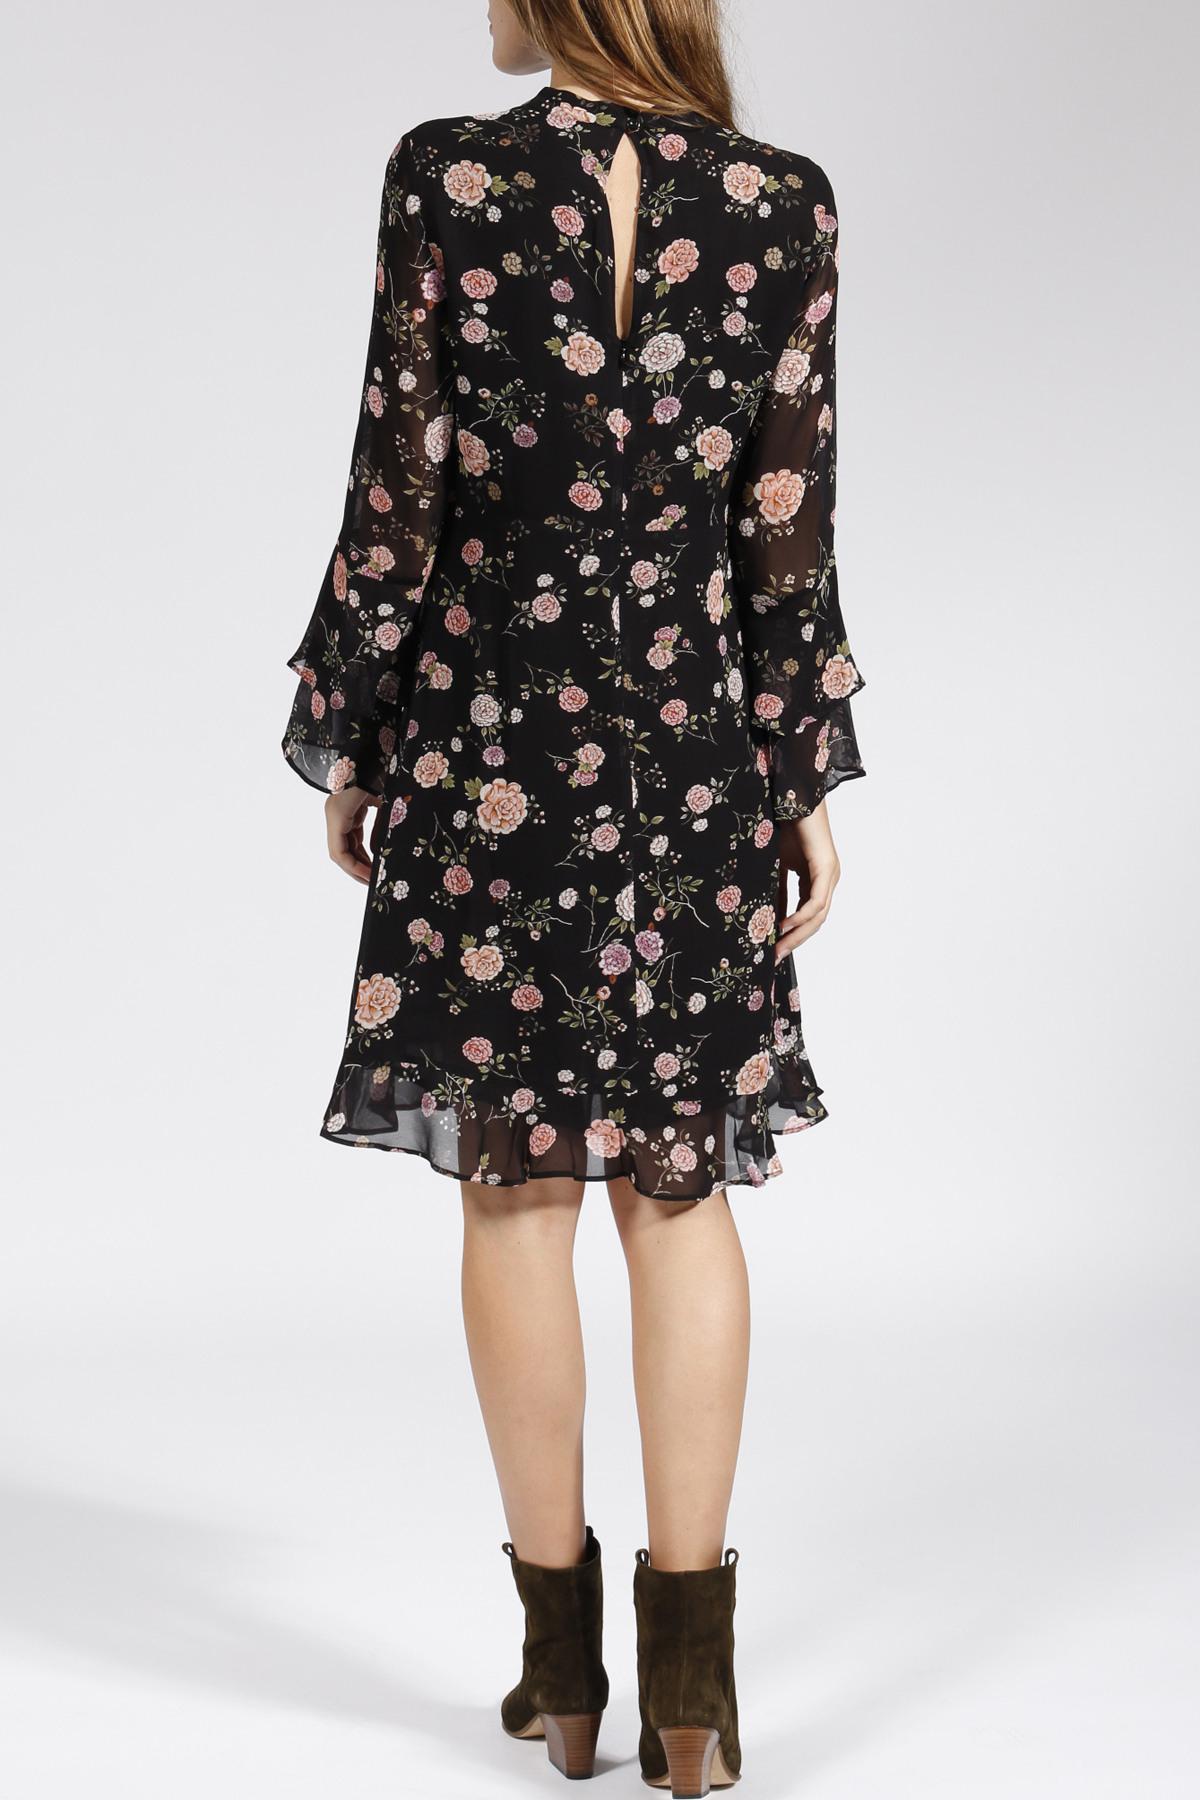 Kleid Mit Floralem Muster Schwarz  Jadicted  Myclassico